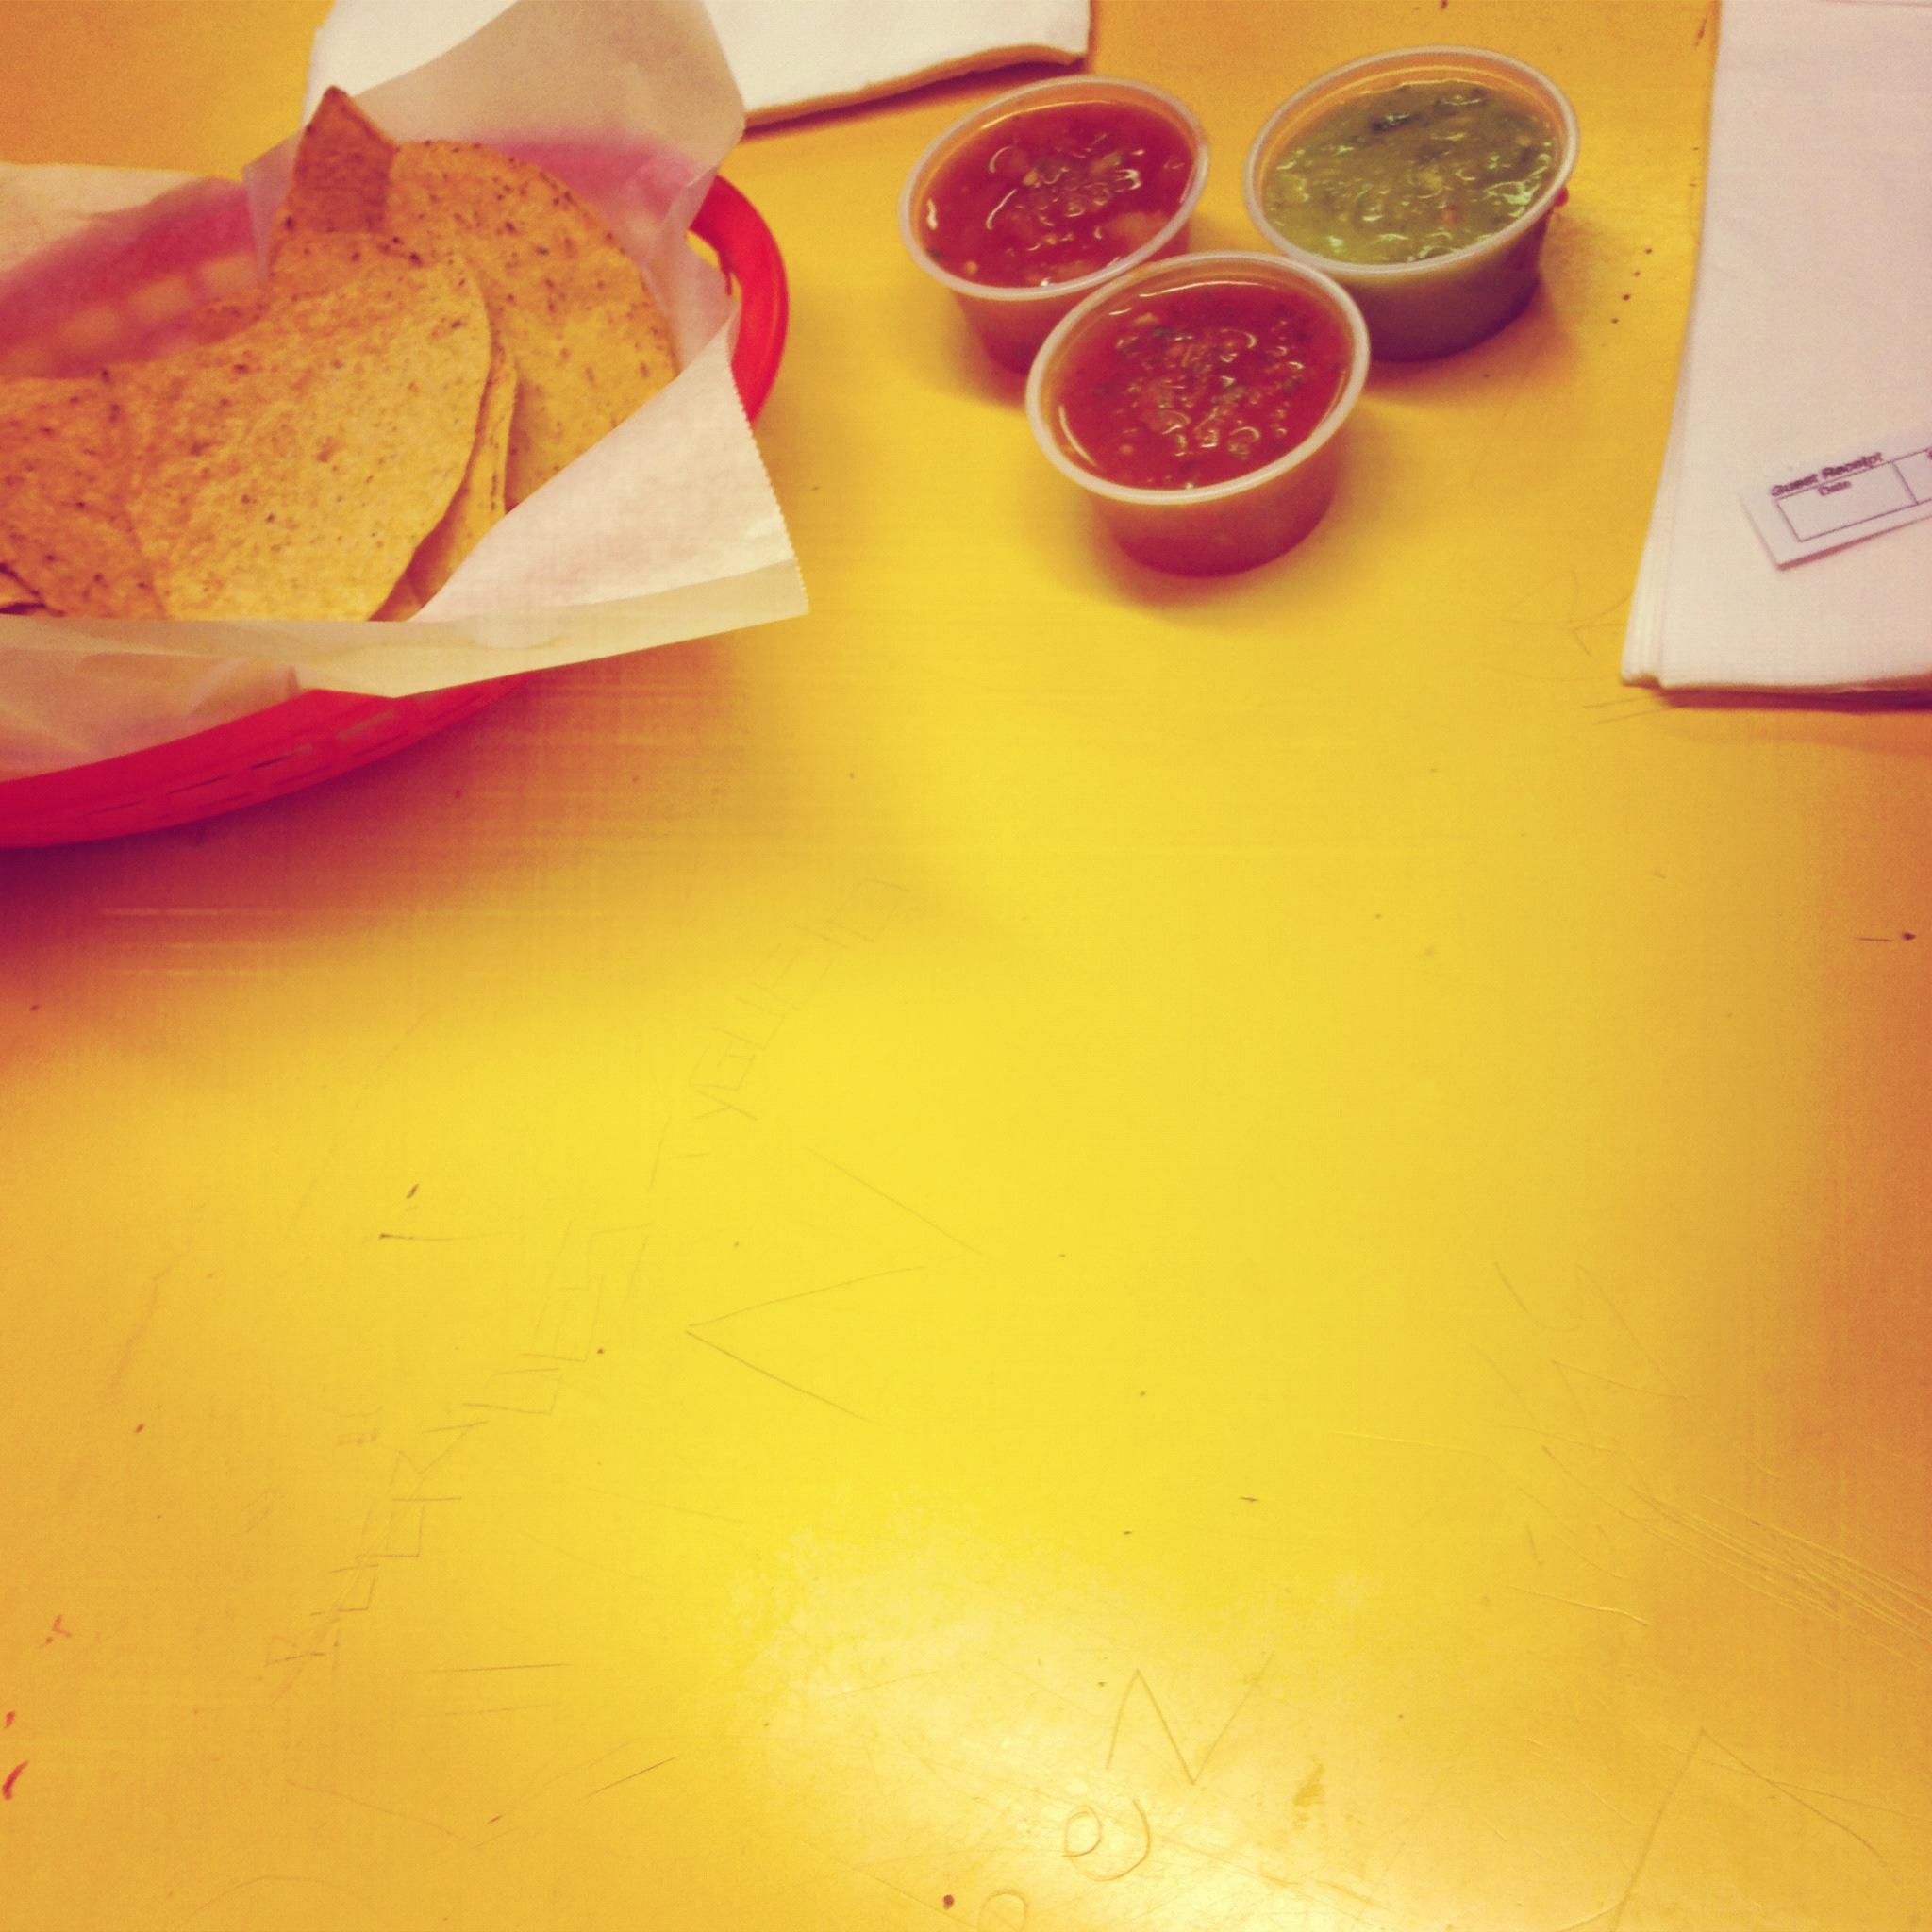 Waiting for Burrito